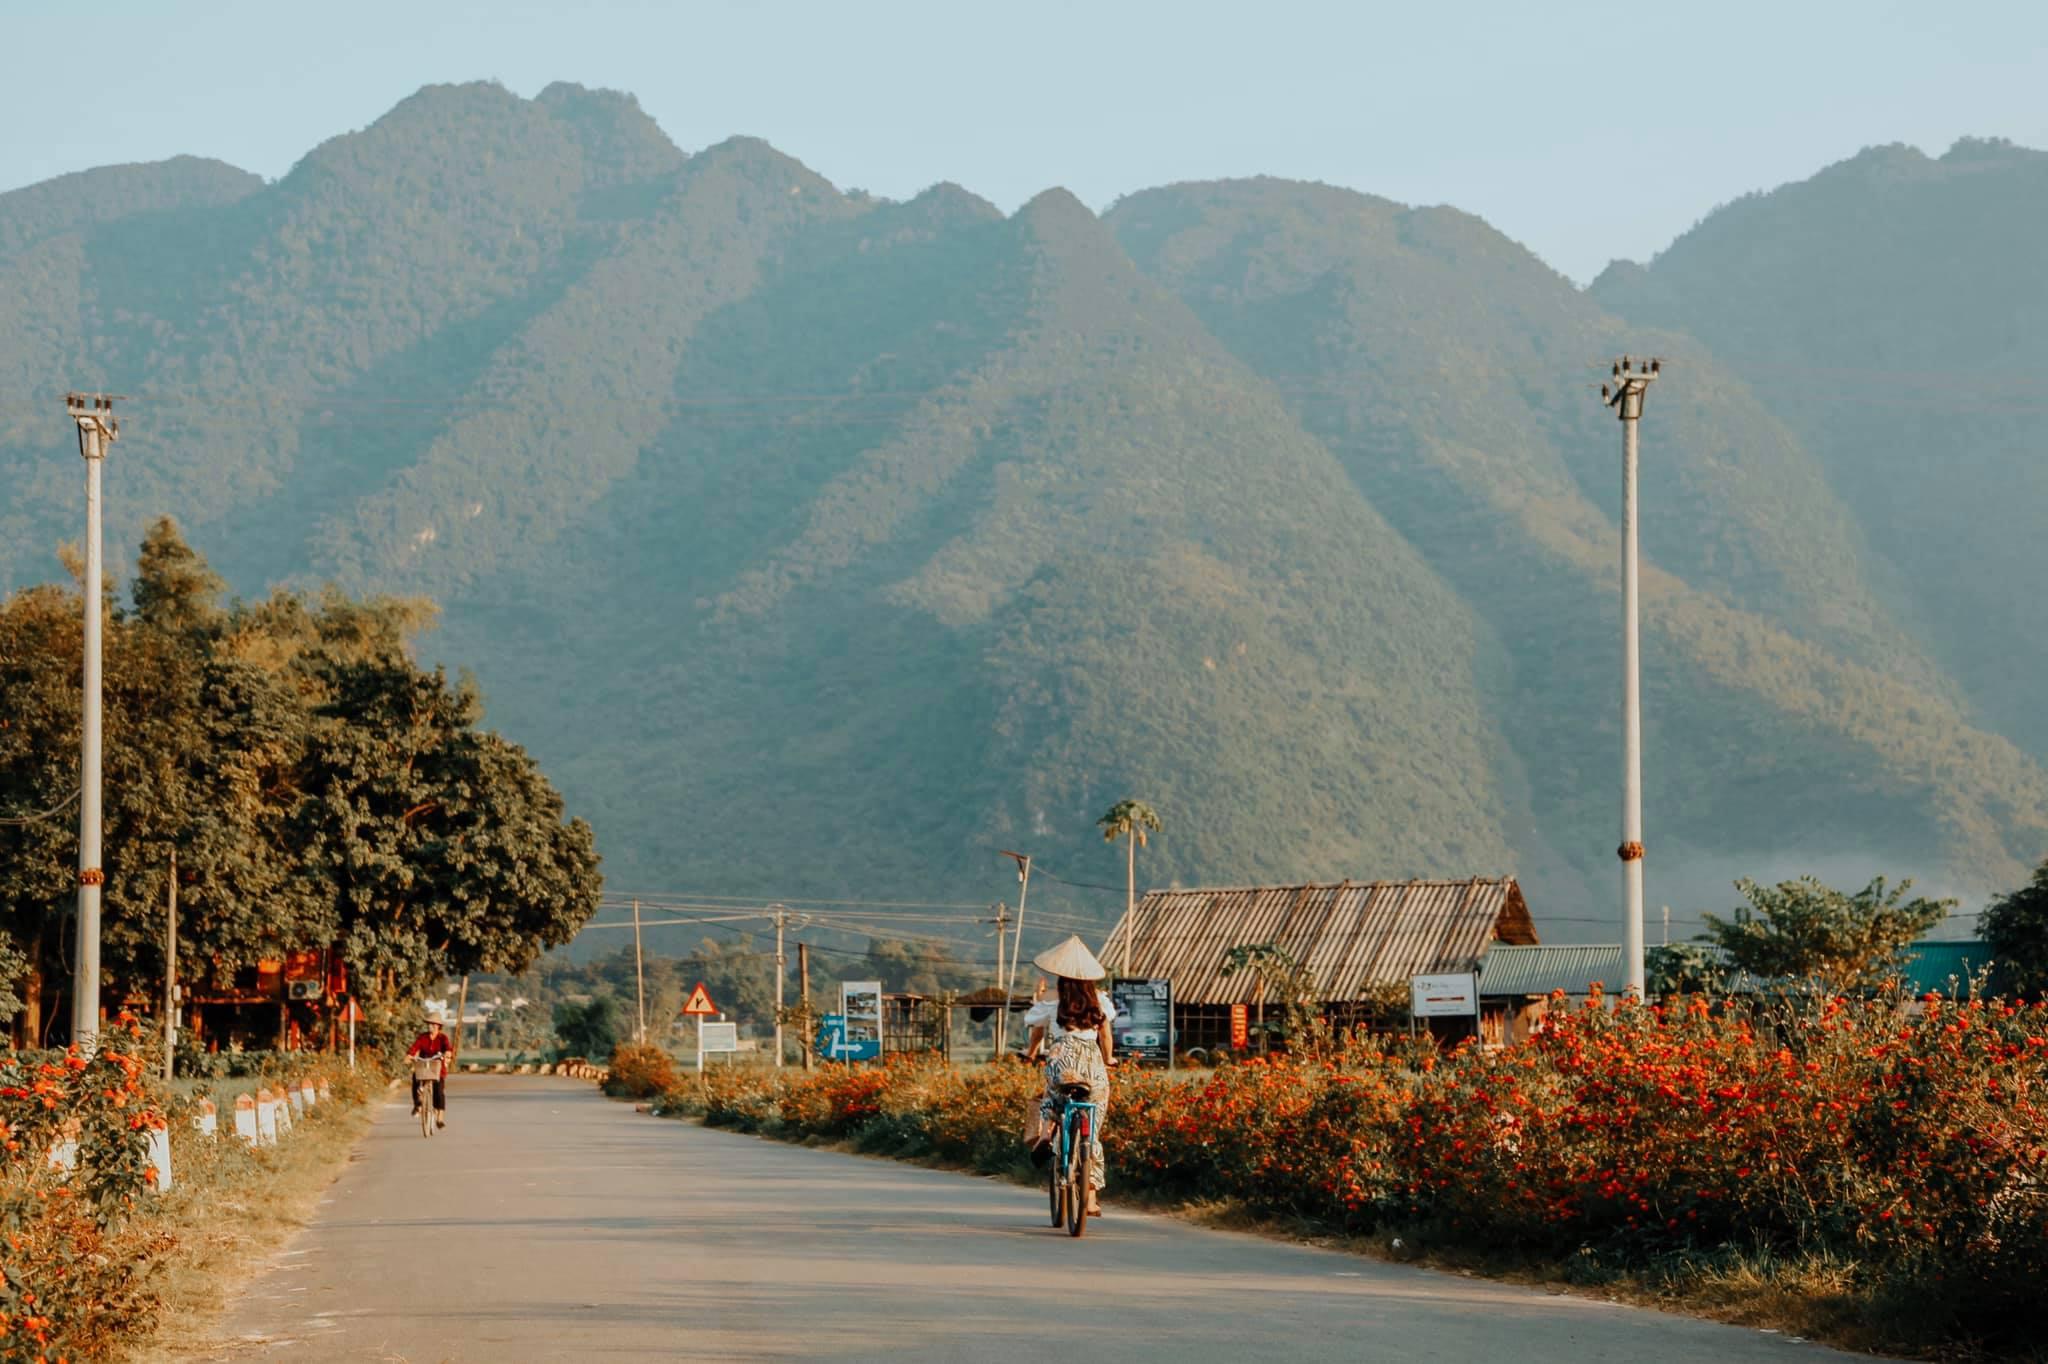 Tong-hop-nhung-dia-diem-du-lich-nui-hot-nhat-trong-dip-30-thang-4-vietmountain-travel14